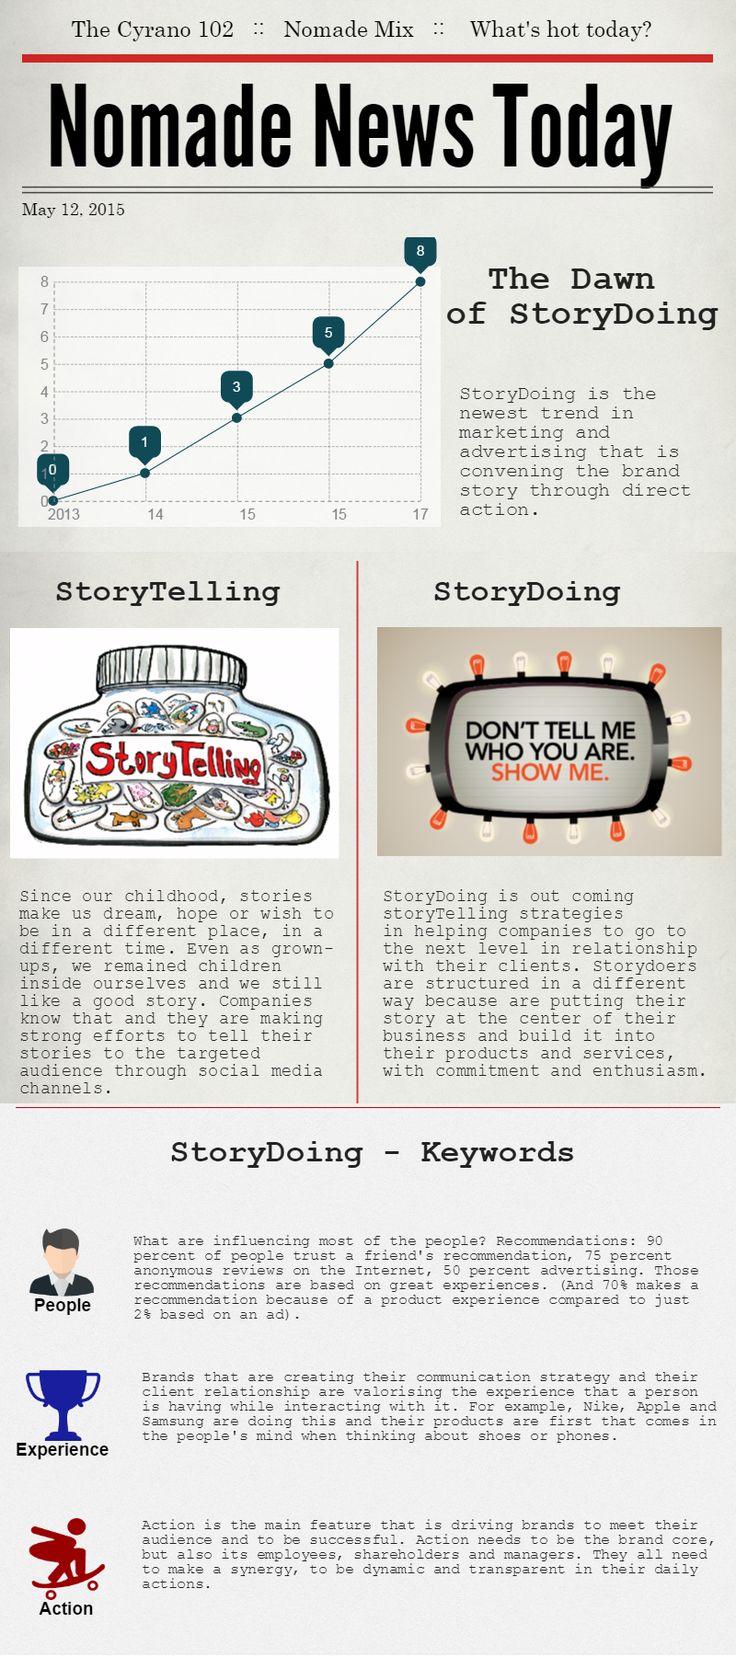 Breaking news! Are you a storydoer or a storyteller? Learn more on www.nomade.ro.  #storytelling #storydoing